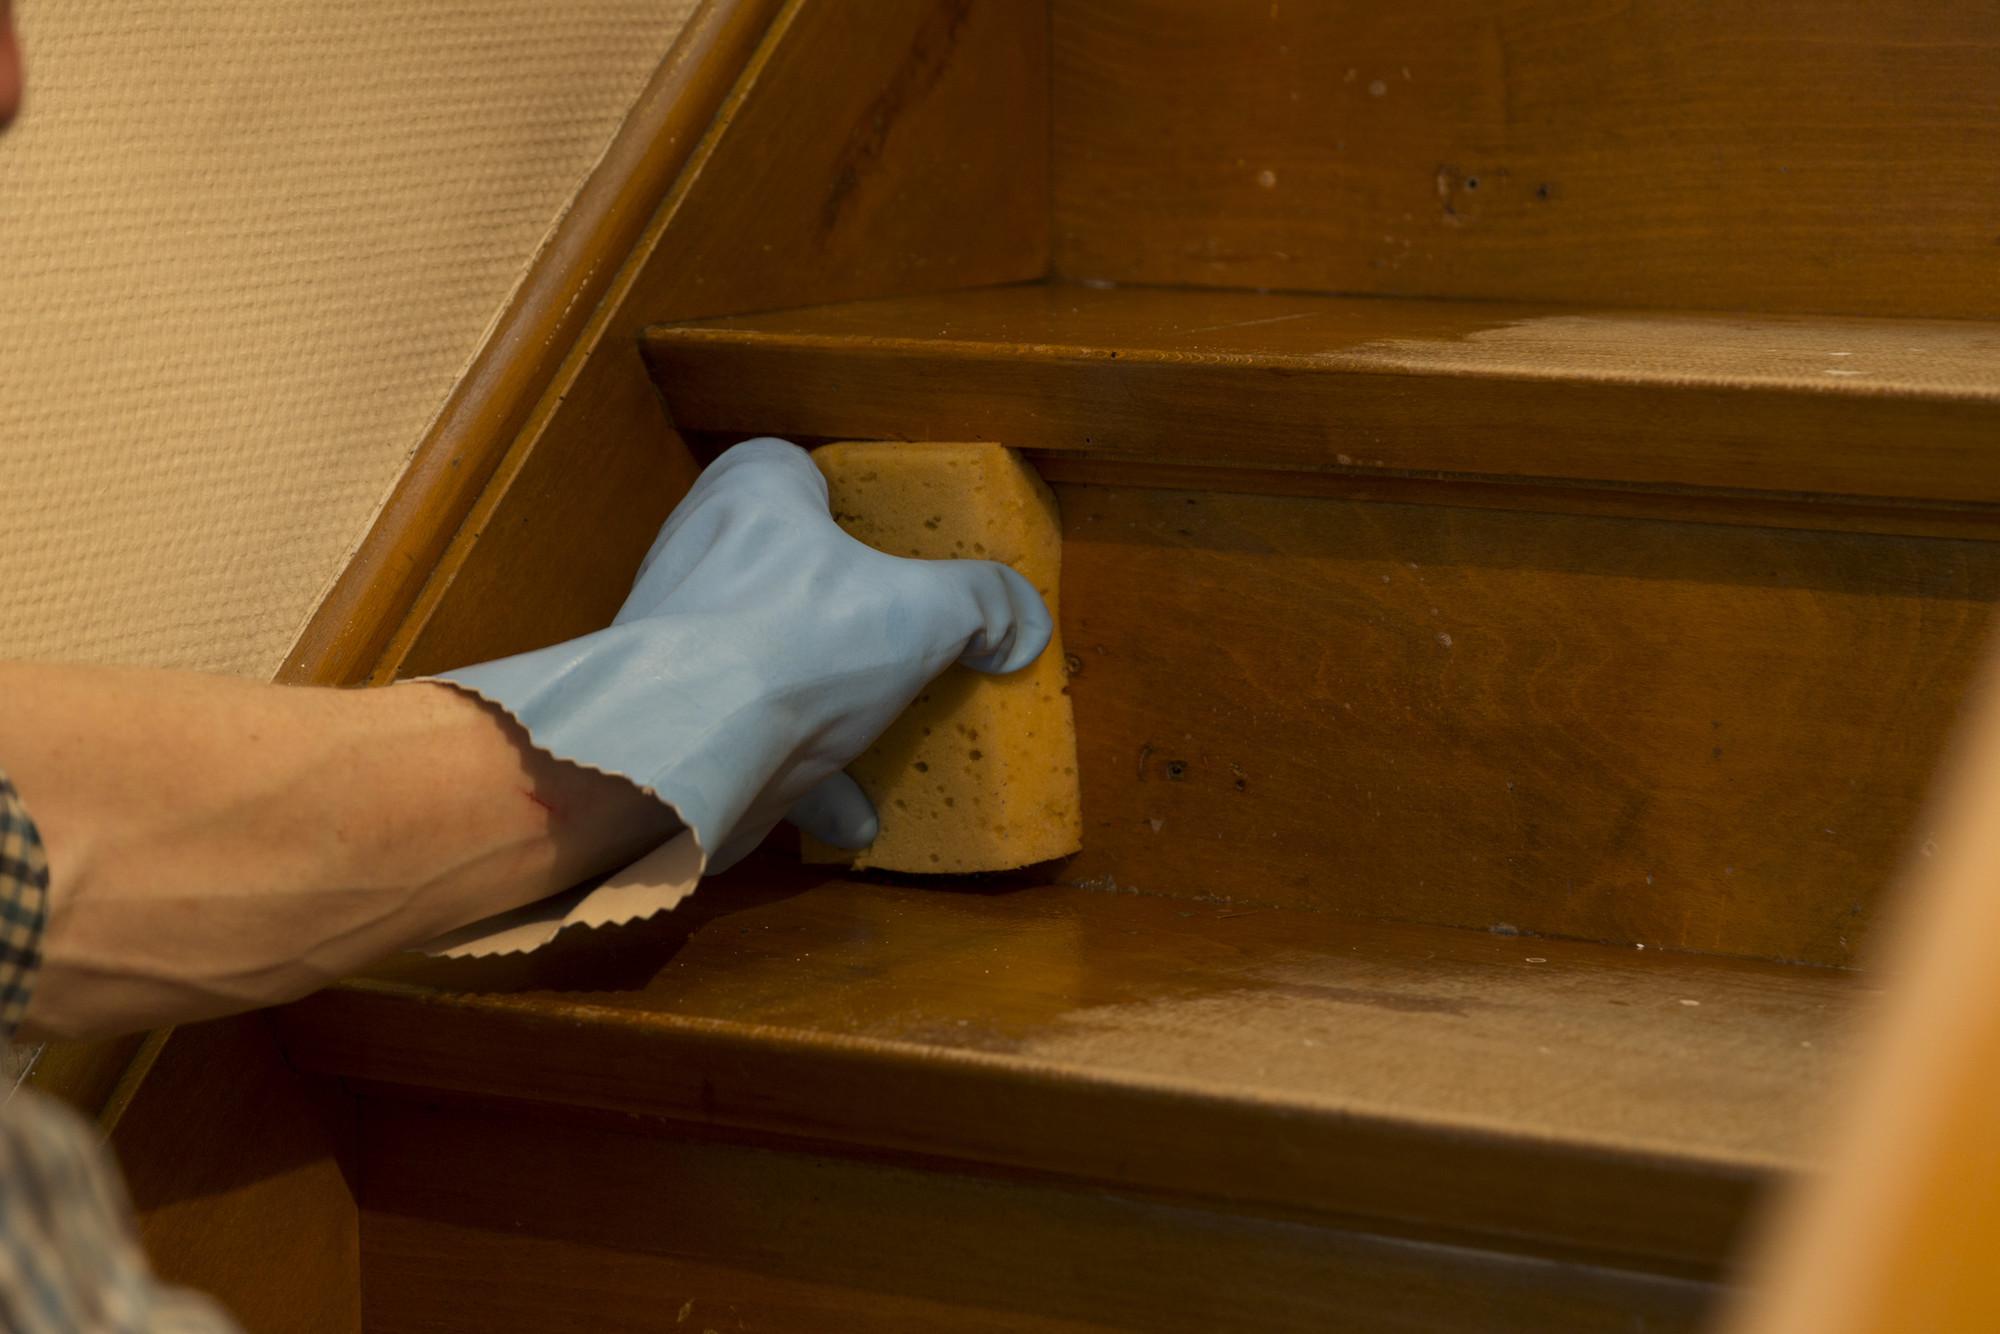 Trap schilderen: ontvet de trap grondig